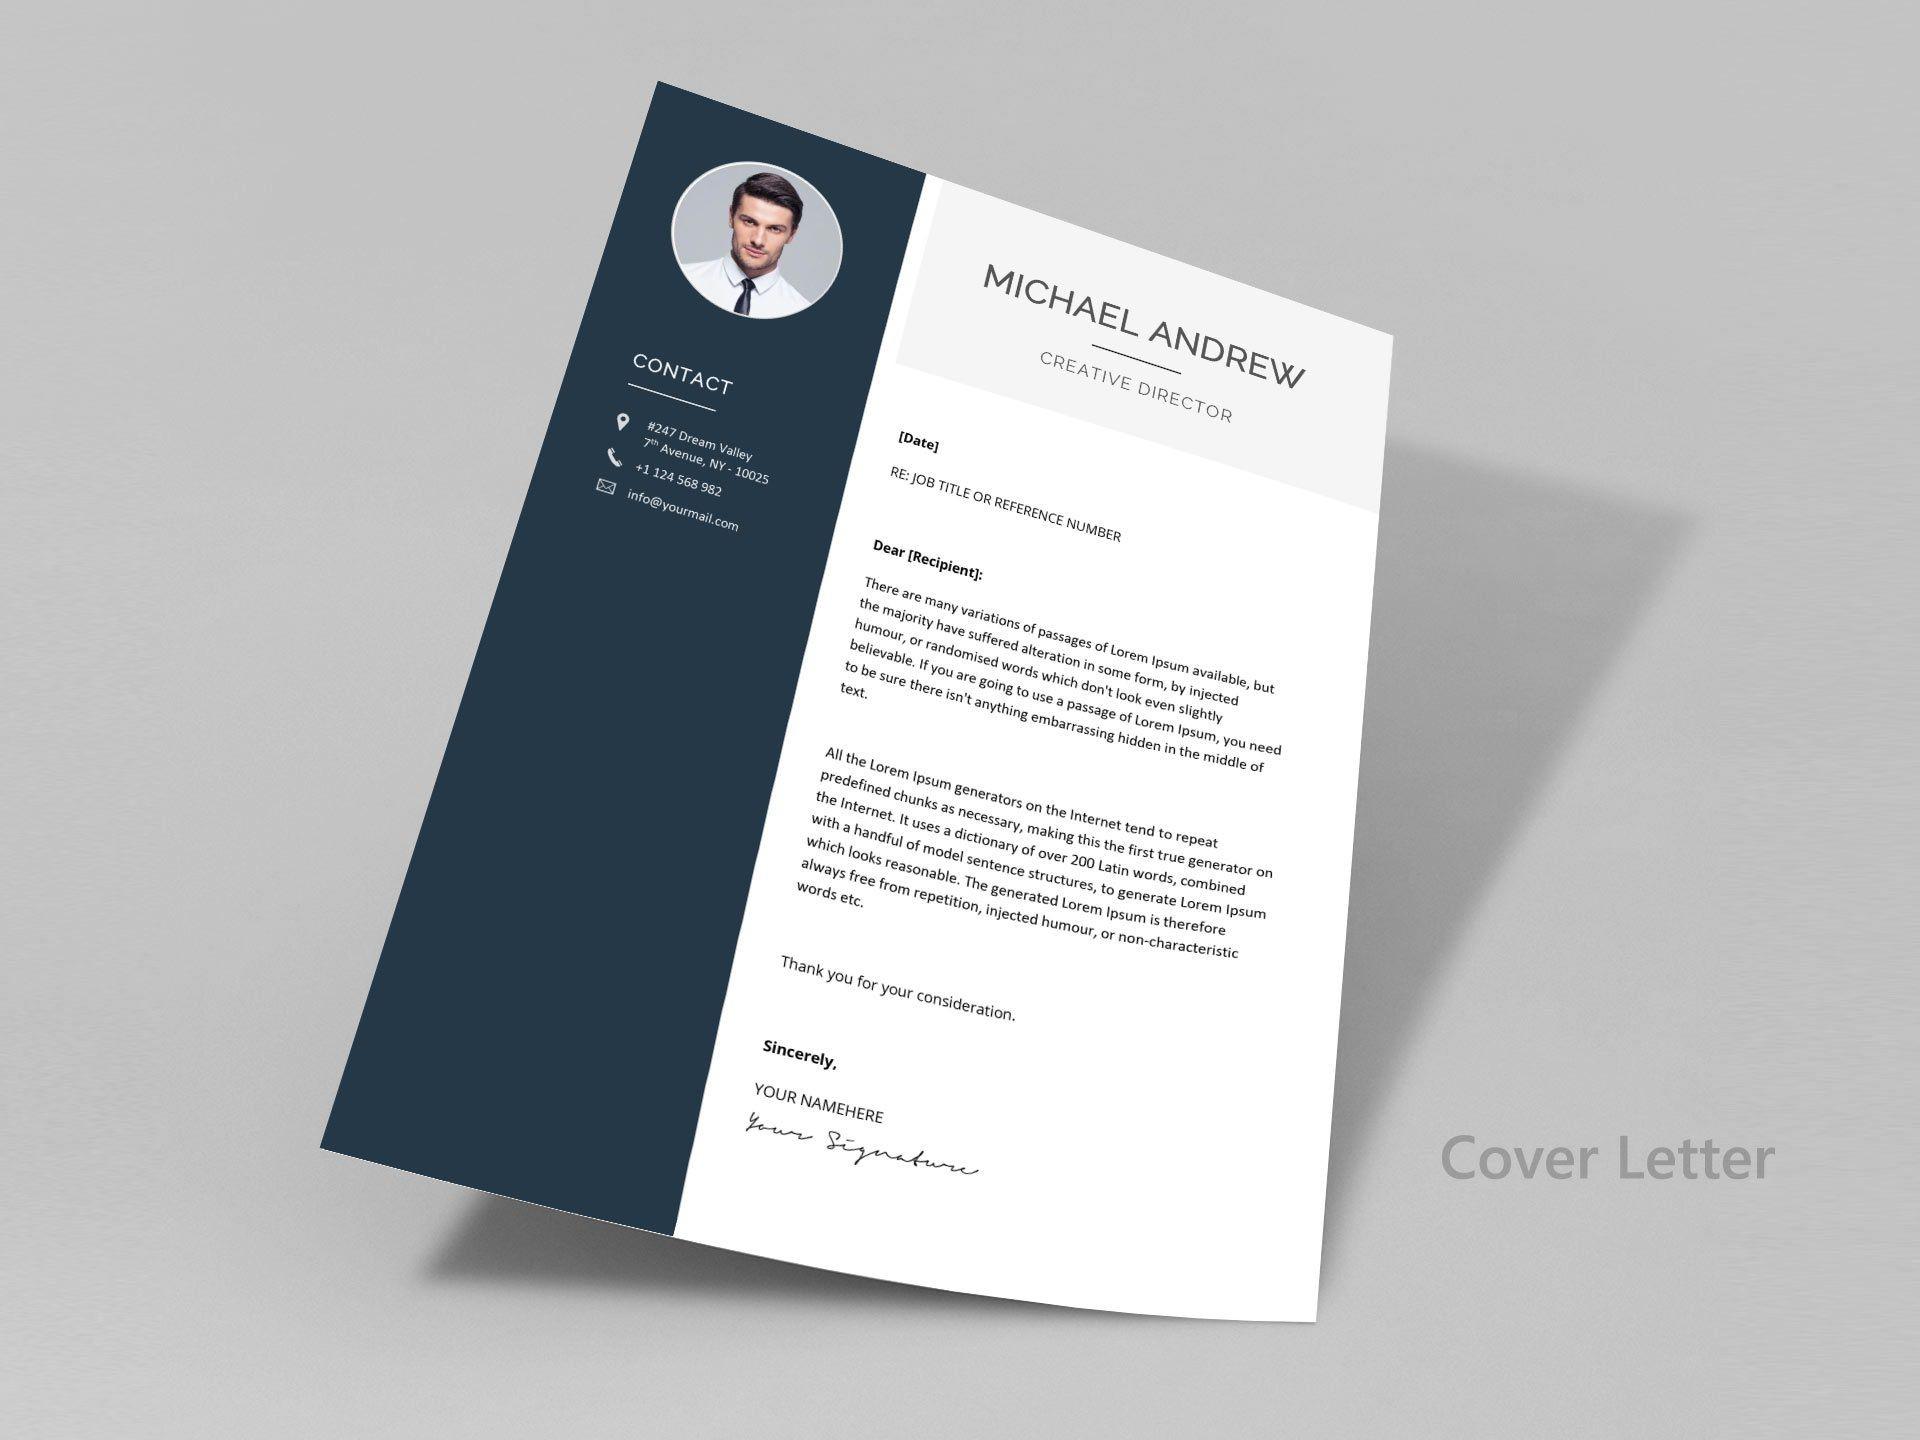 007 Fantastic Professional Resume Template 2019 Free Download Highest Quality  Cv1920